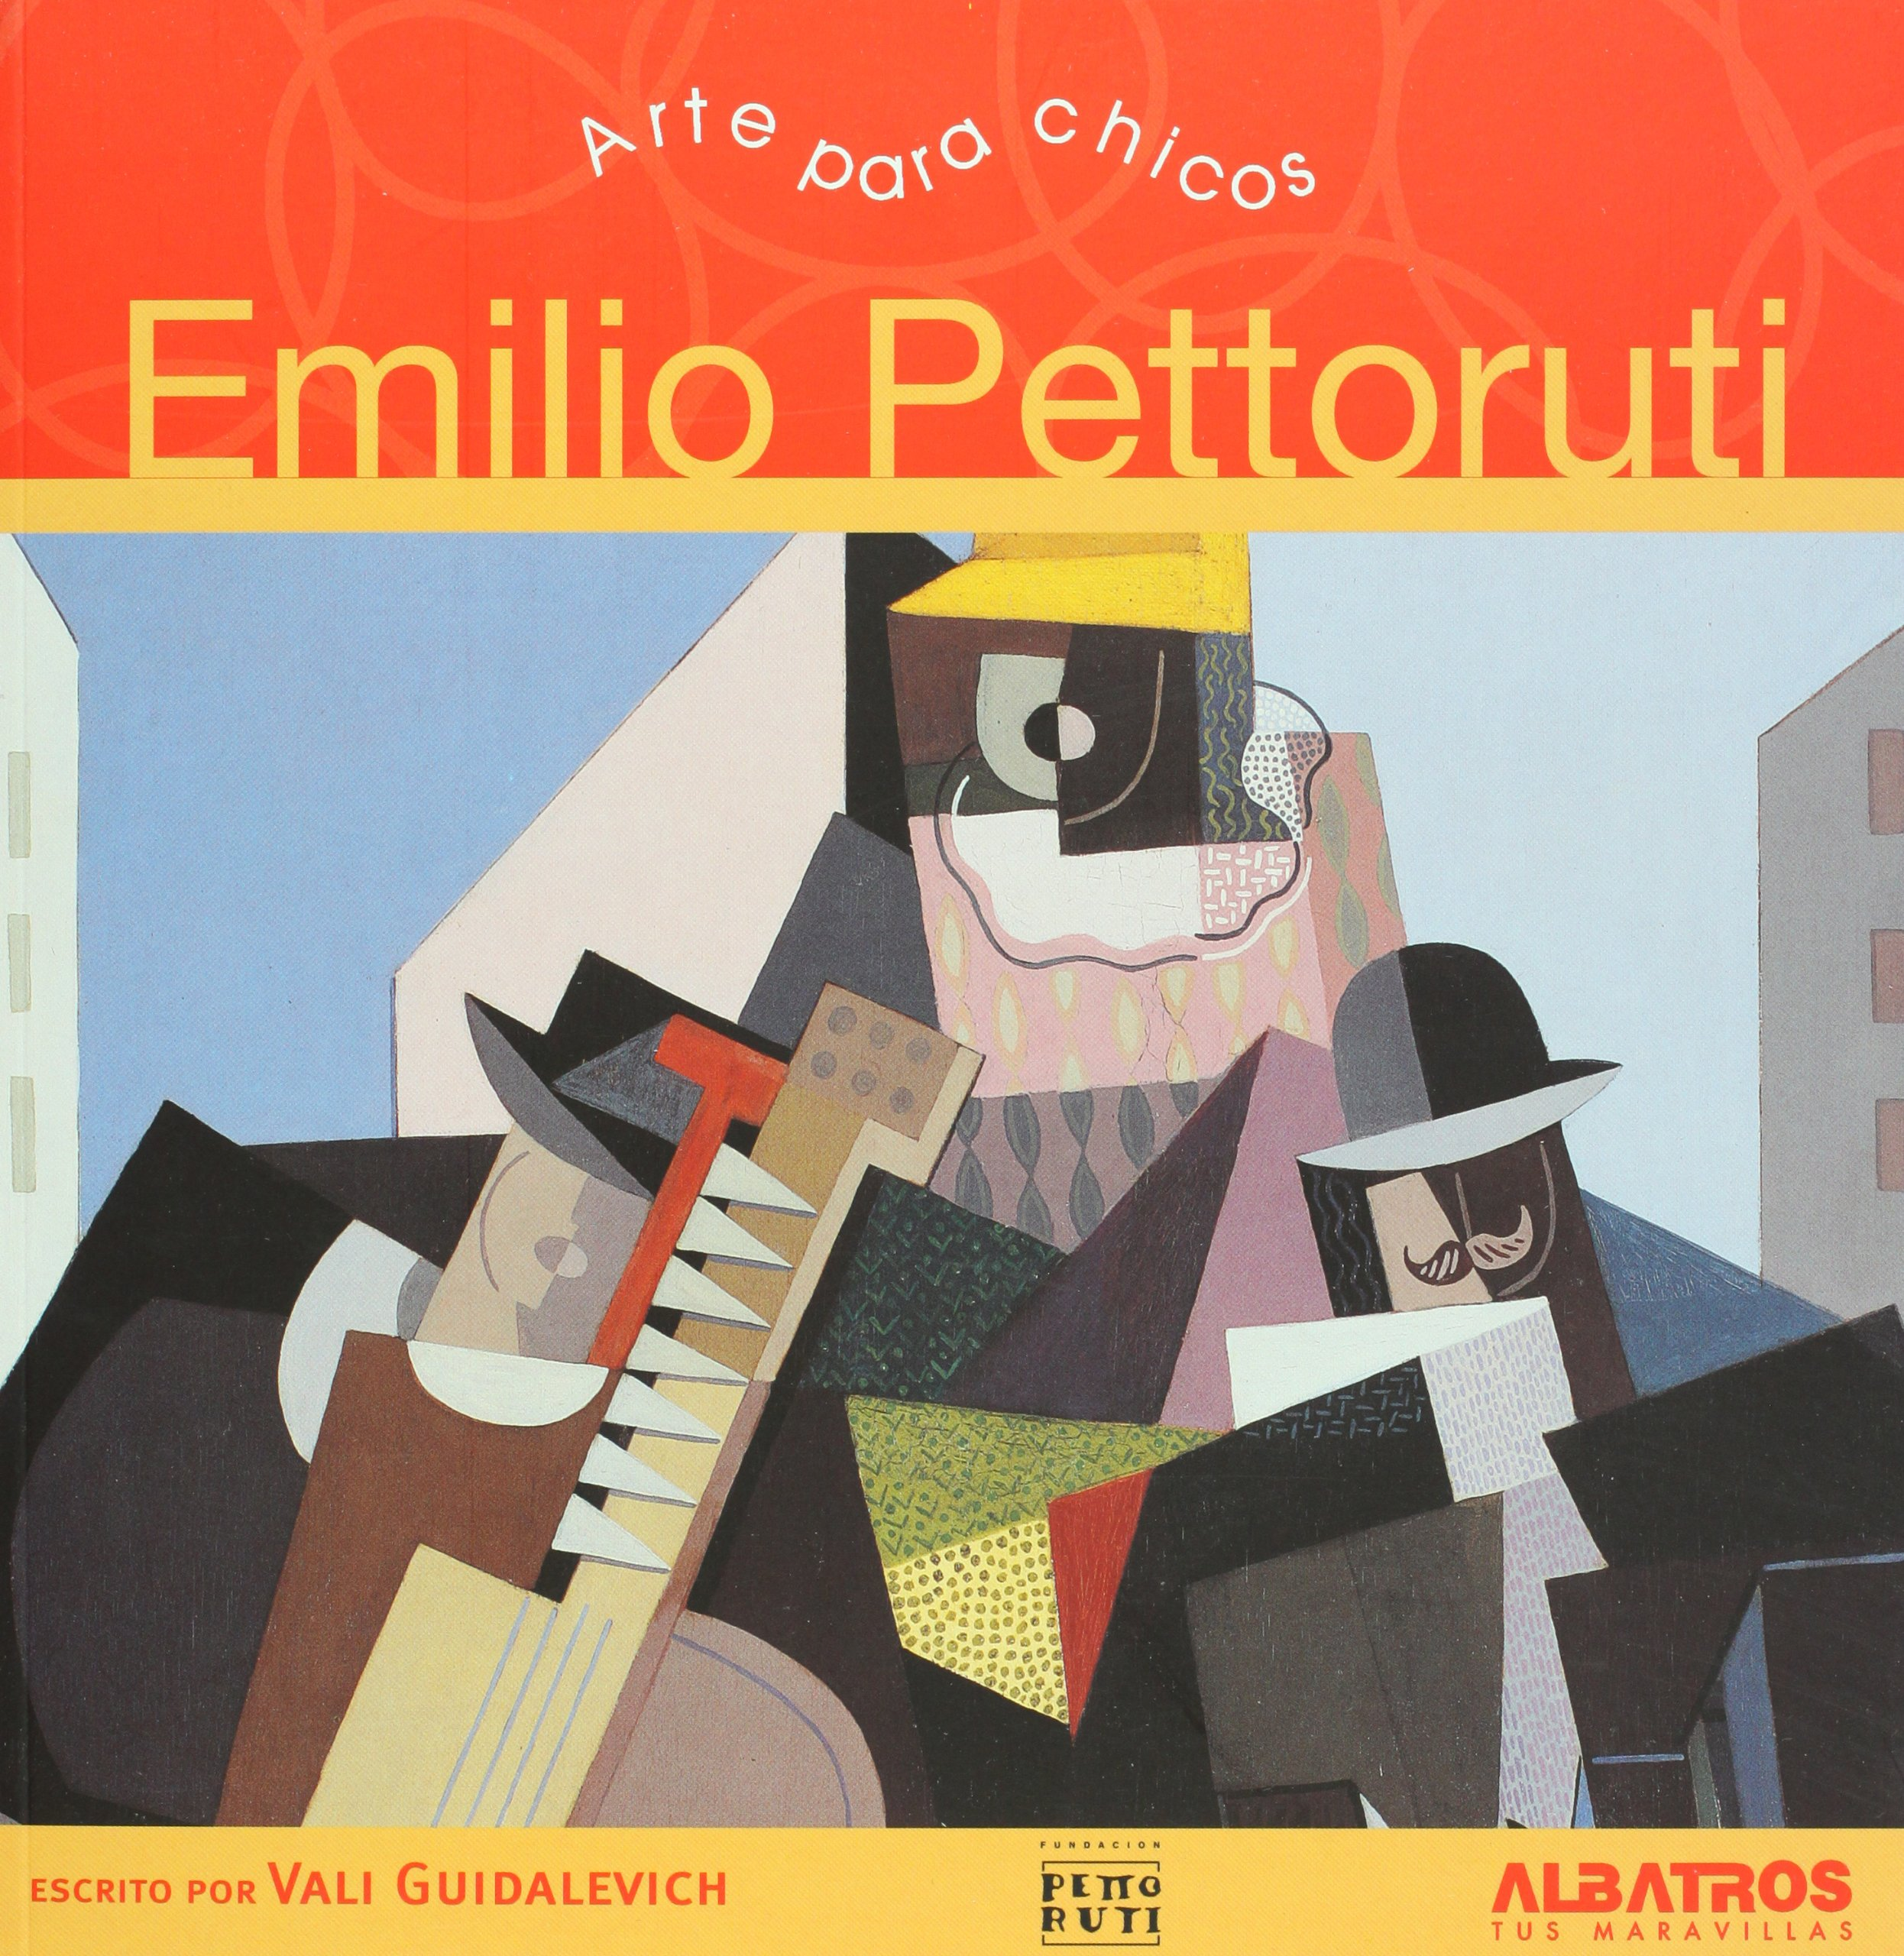 Emilio Pettoruti Tapa blanda – 28 feb 2010 Vali Guidalevich Albatros/Argentina 9502412842 Art - History